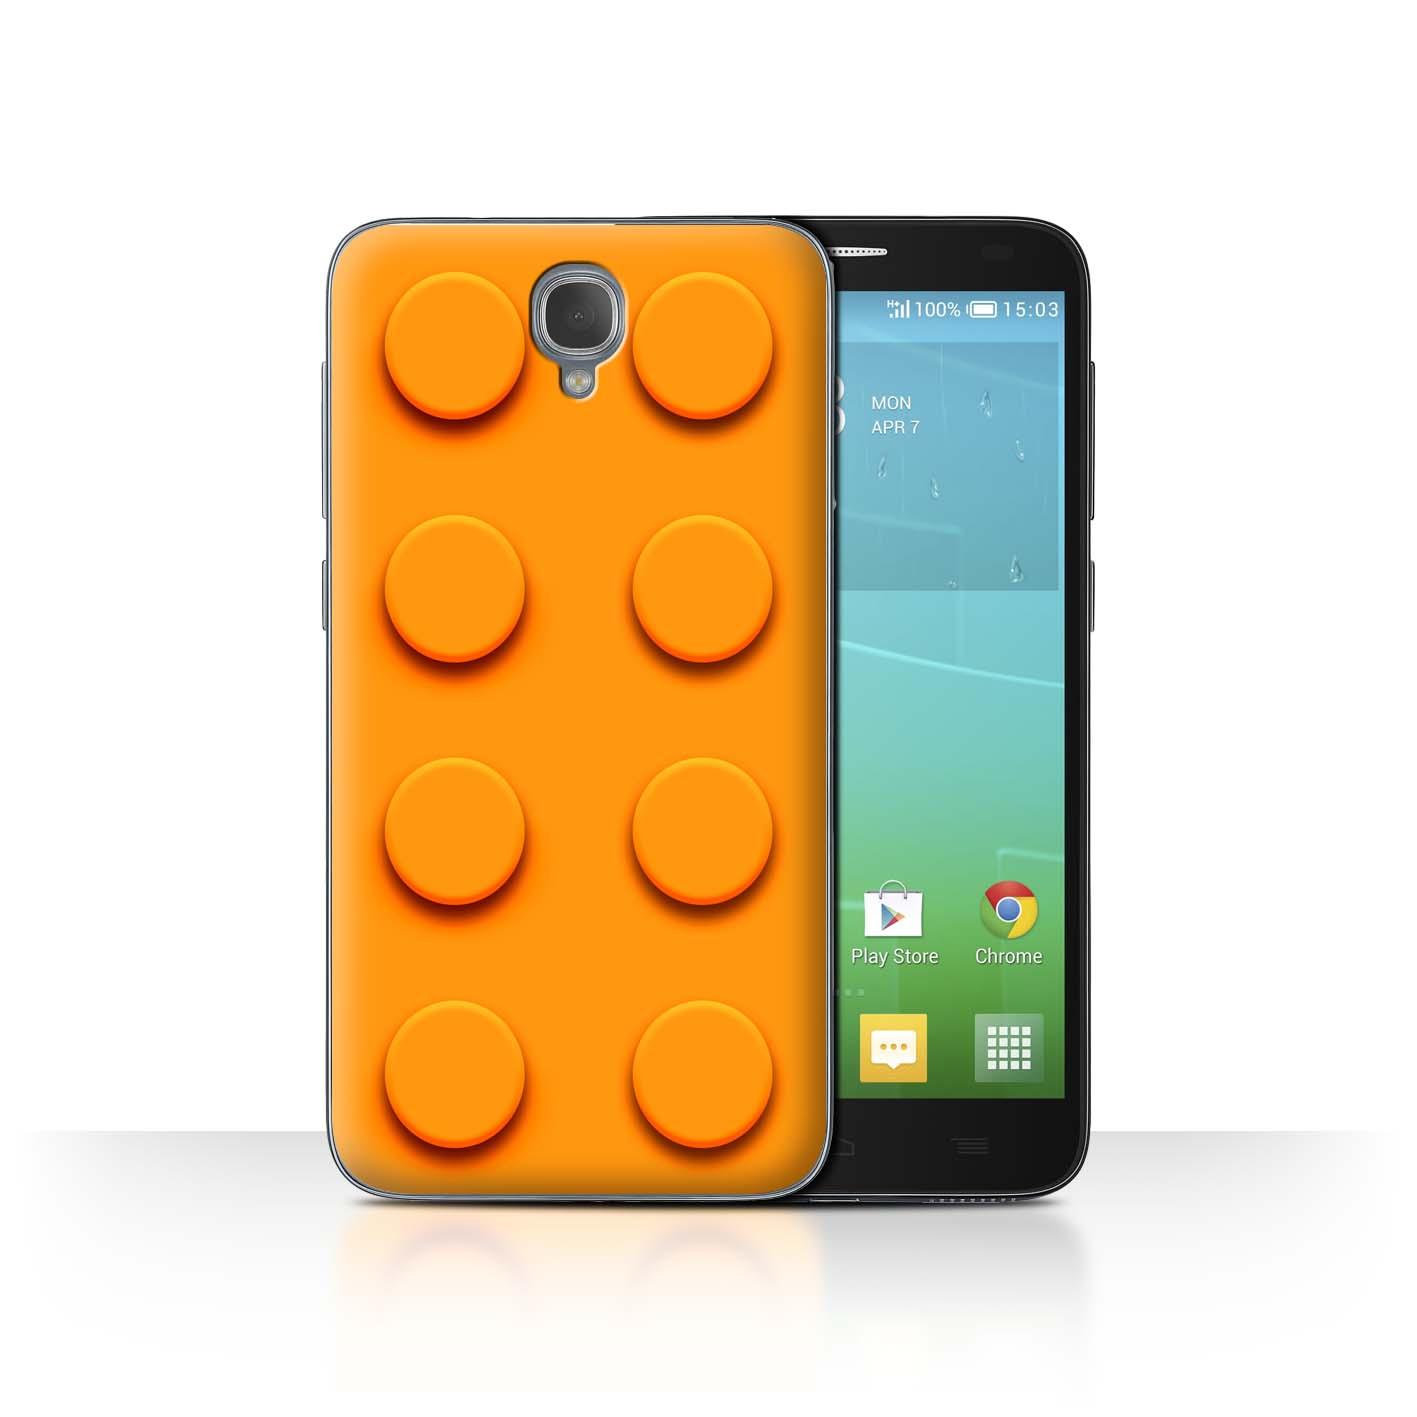 STUFF4-Back-Case-Cover-Skin-for-Alcatel-Idol-2-Toy-Bricks-Blocks